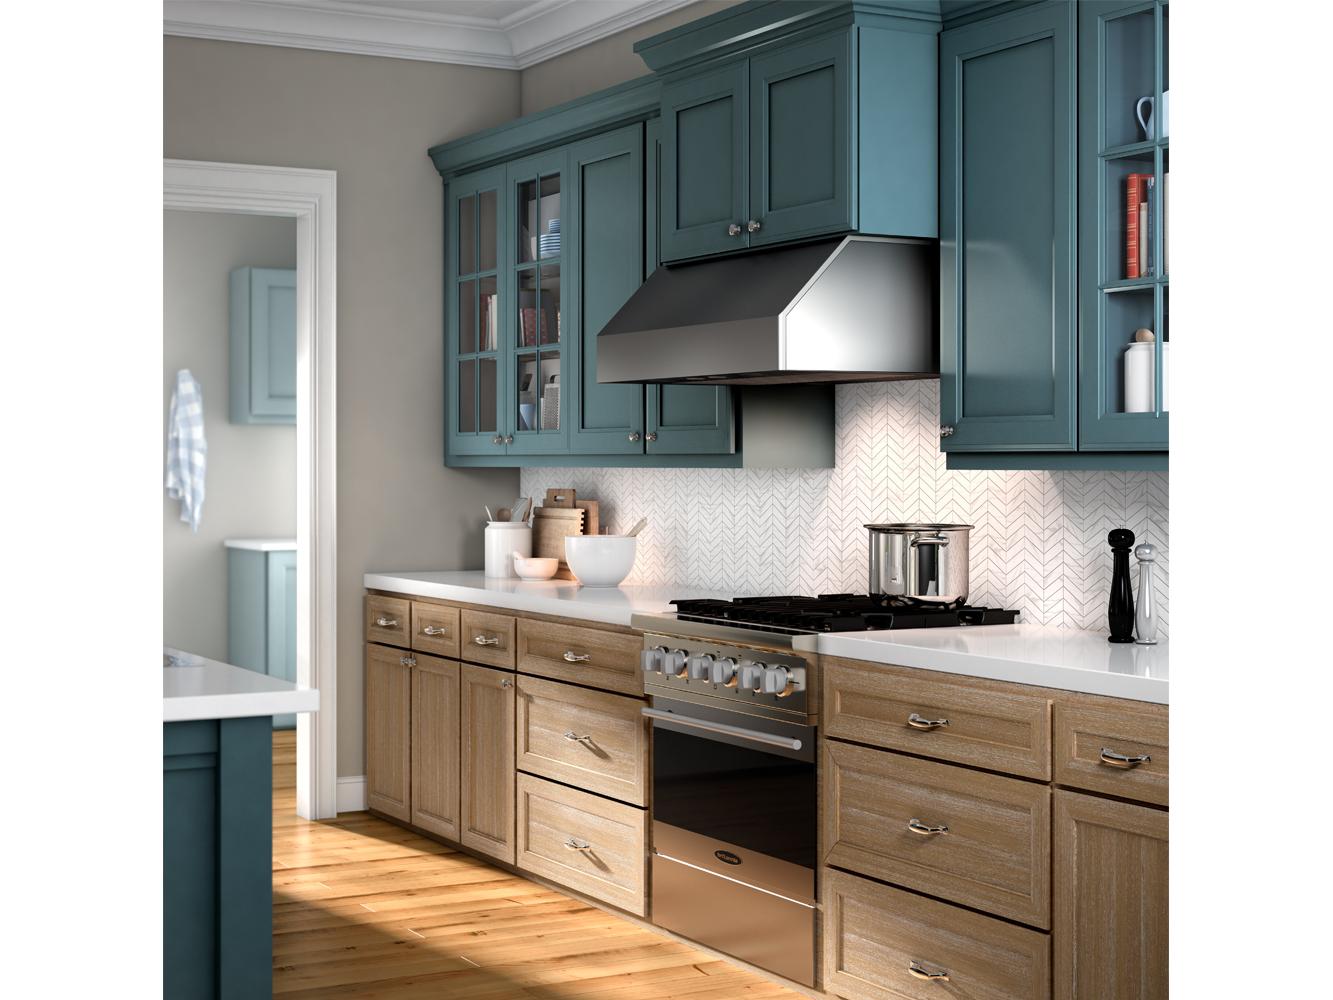 pix-us-cg-blue-kitchen